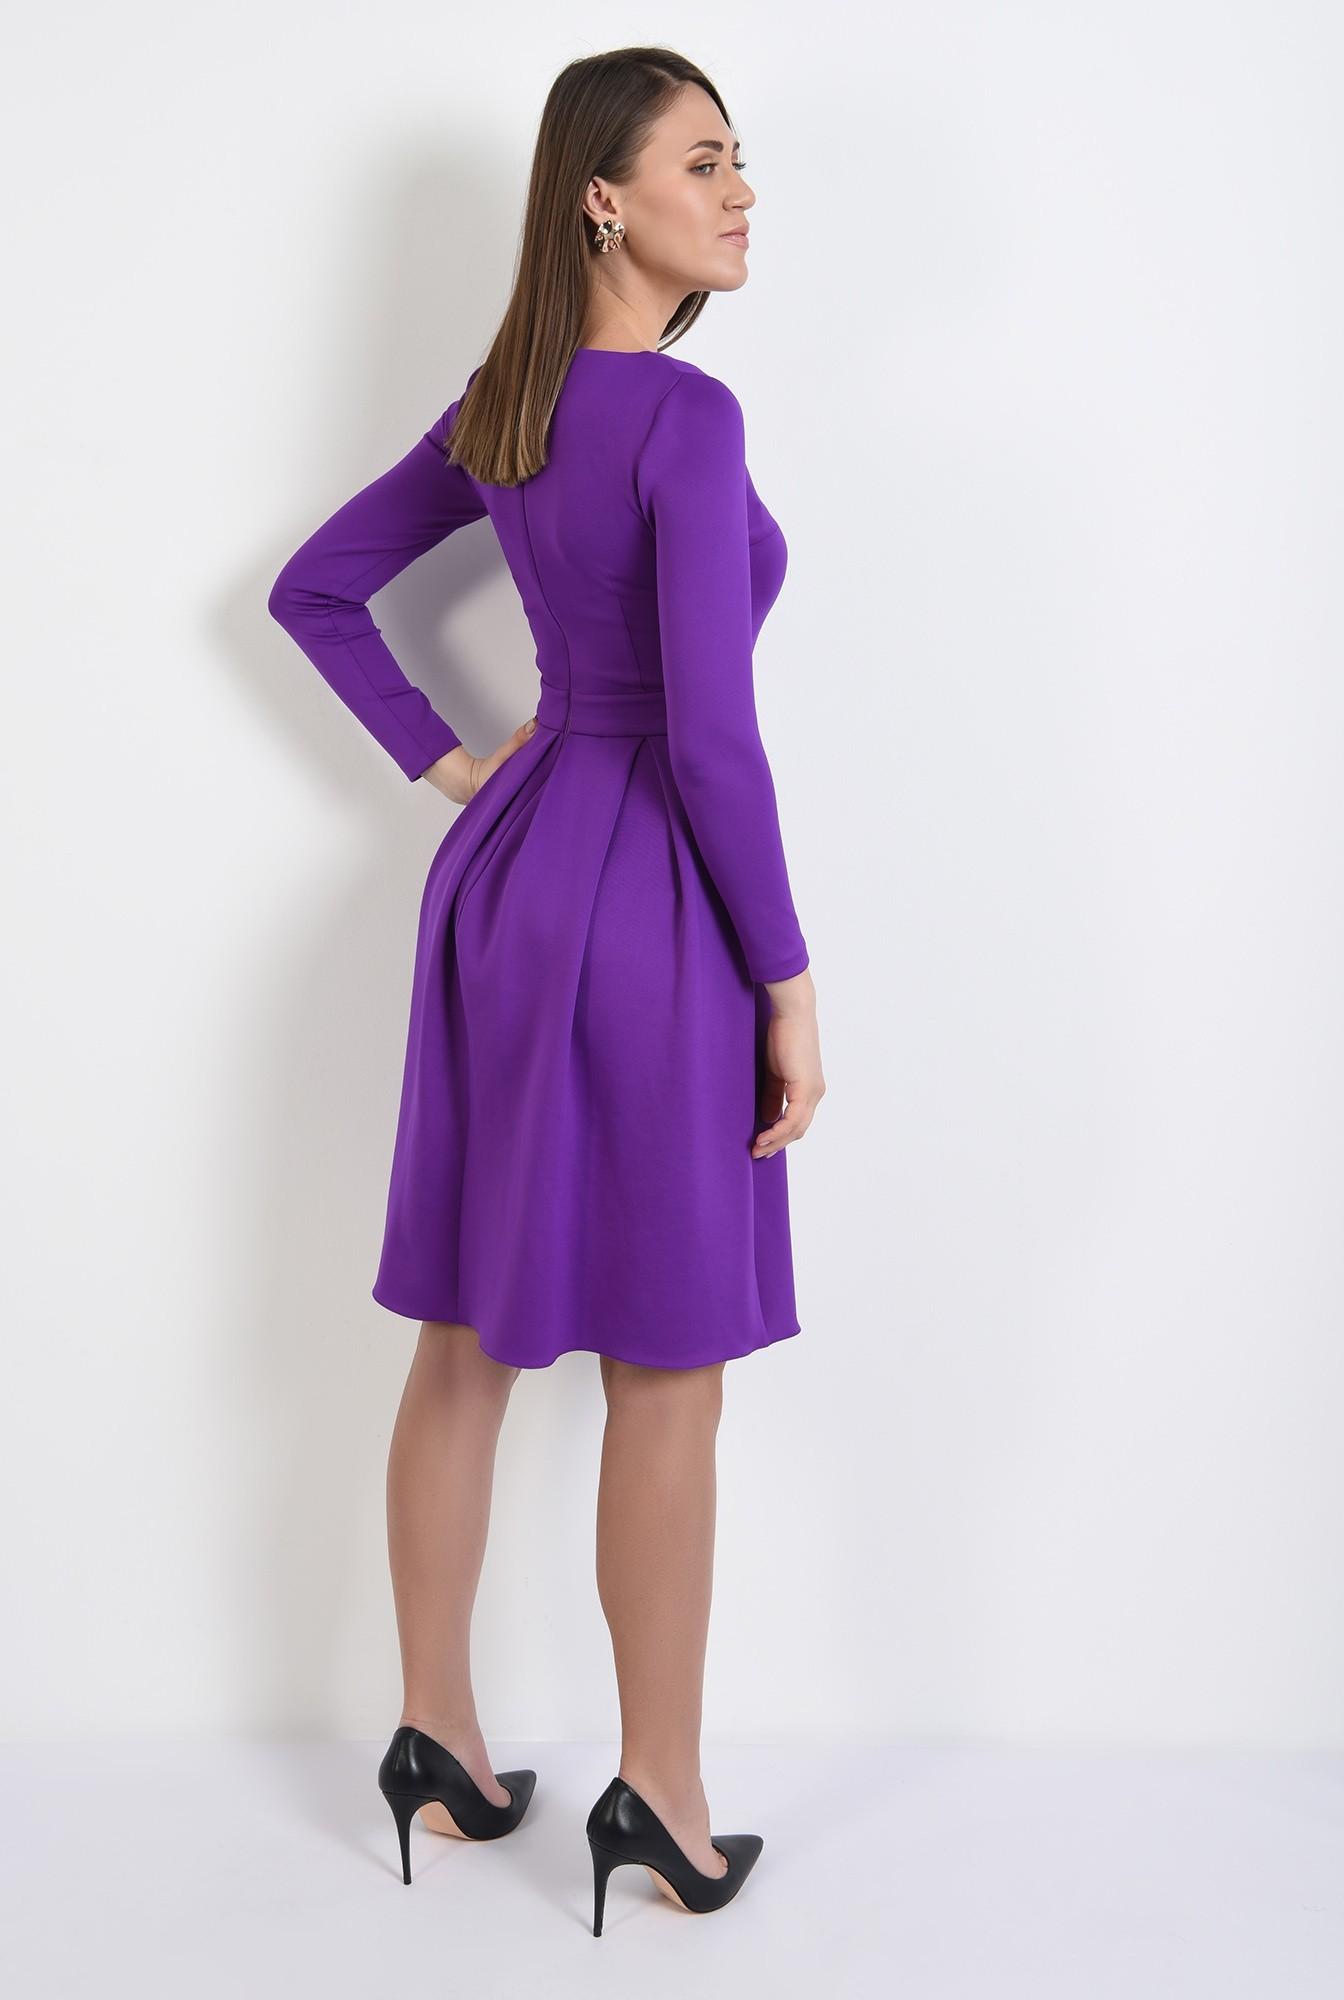 1 - rochie eleganta, evazata, mov, cu pliuri late, maneci stretch